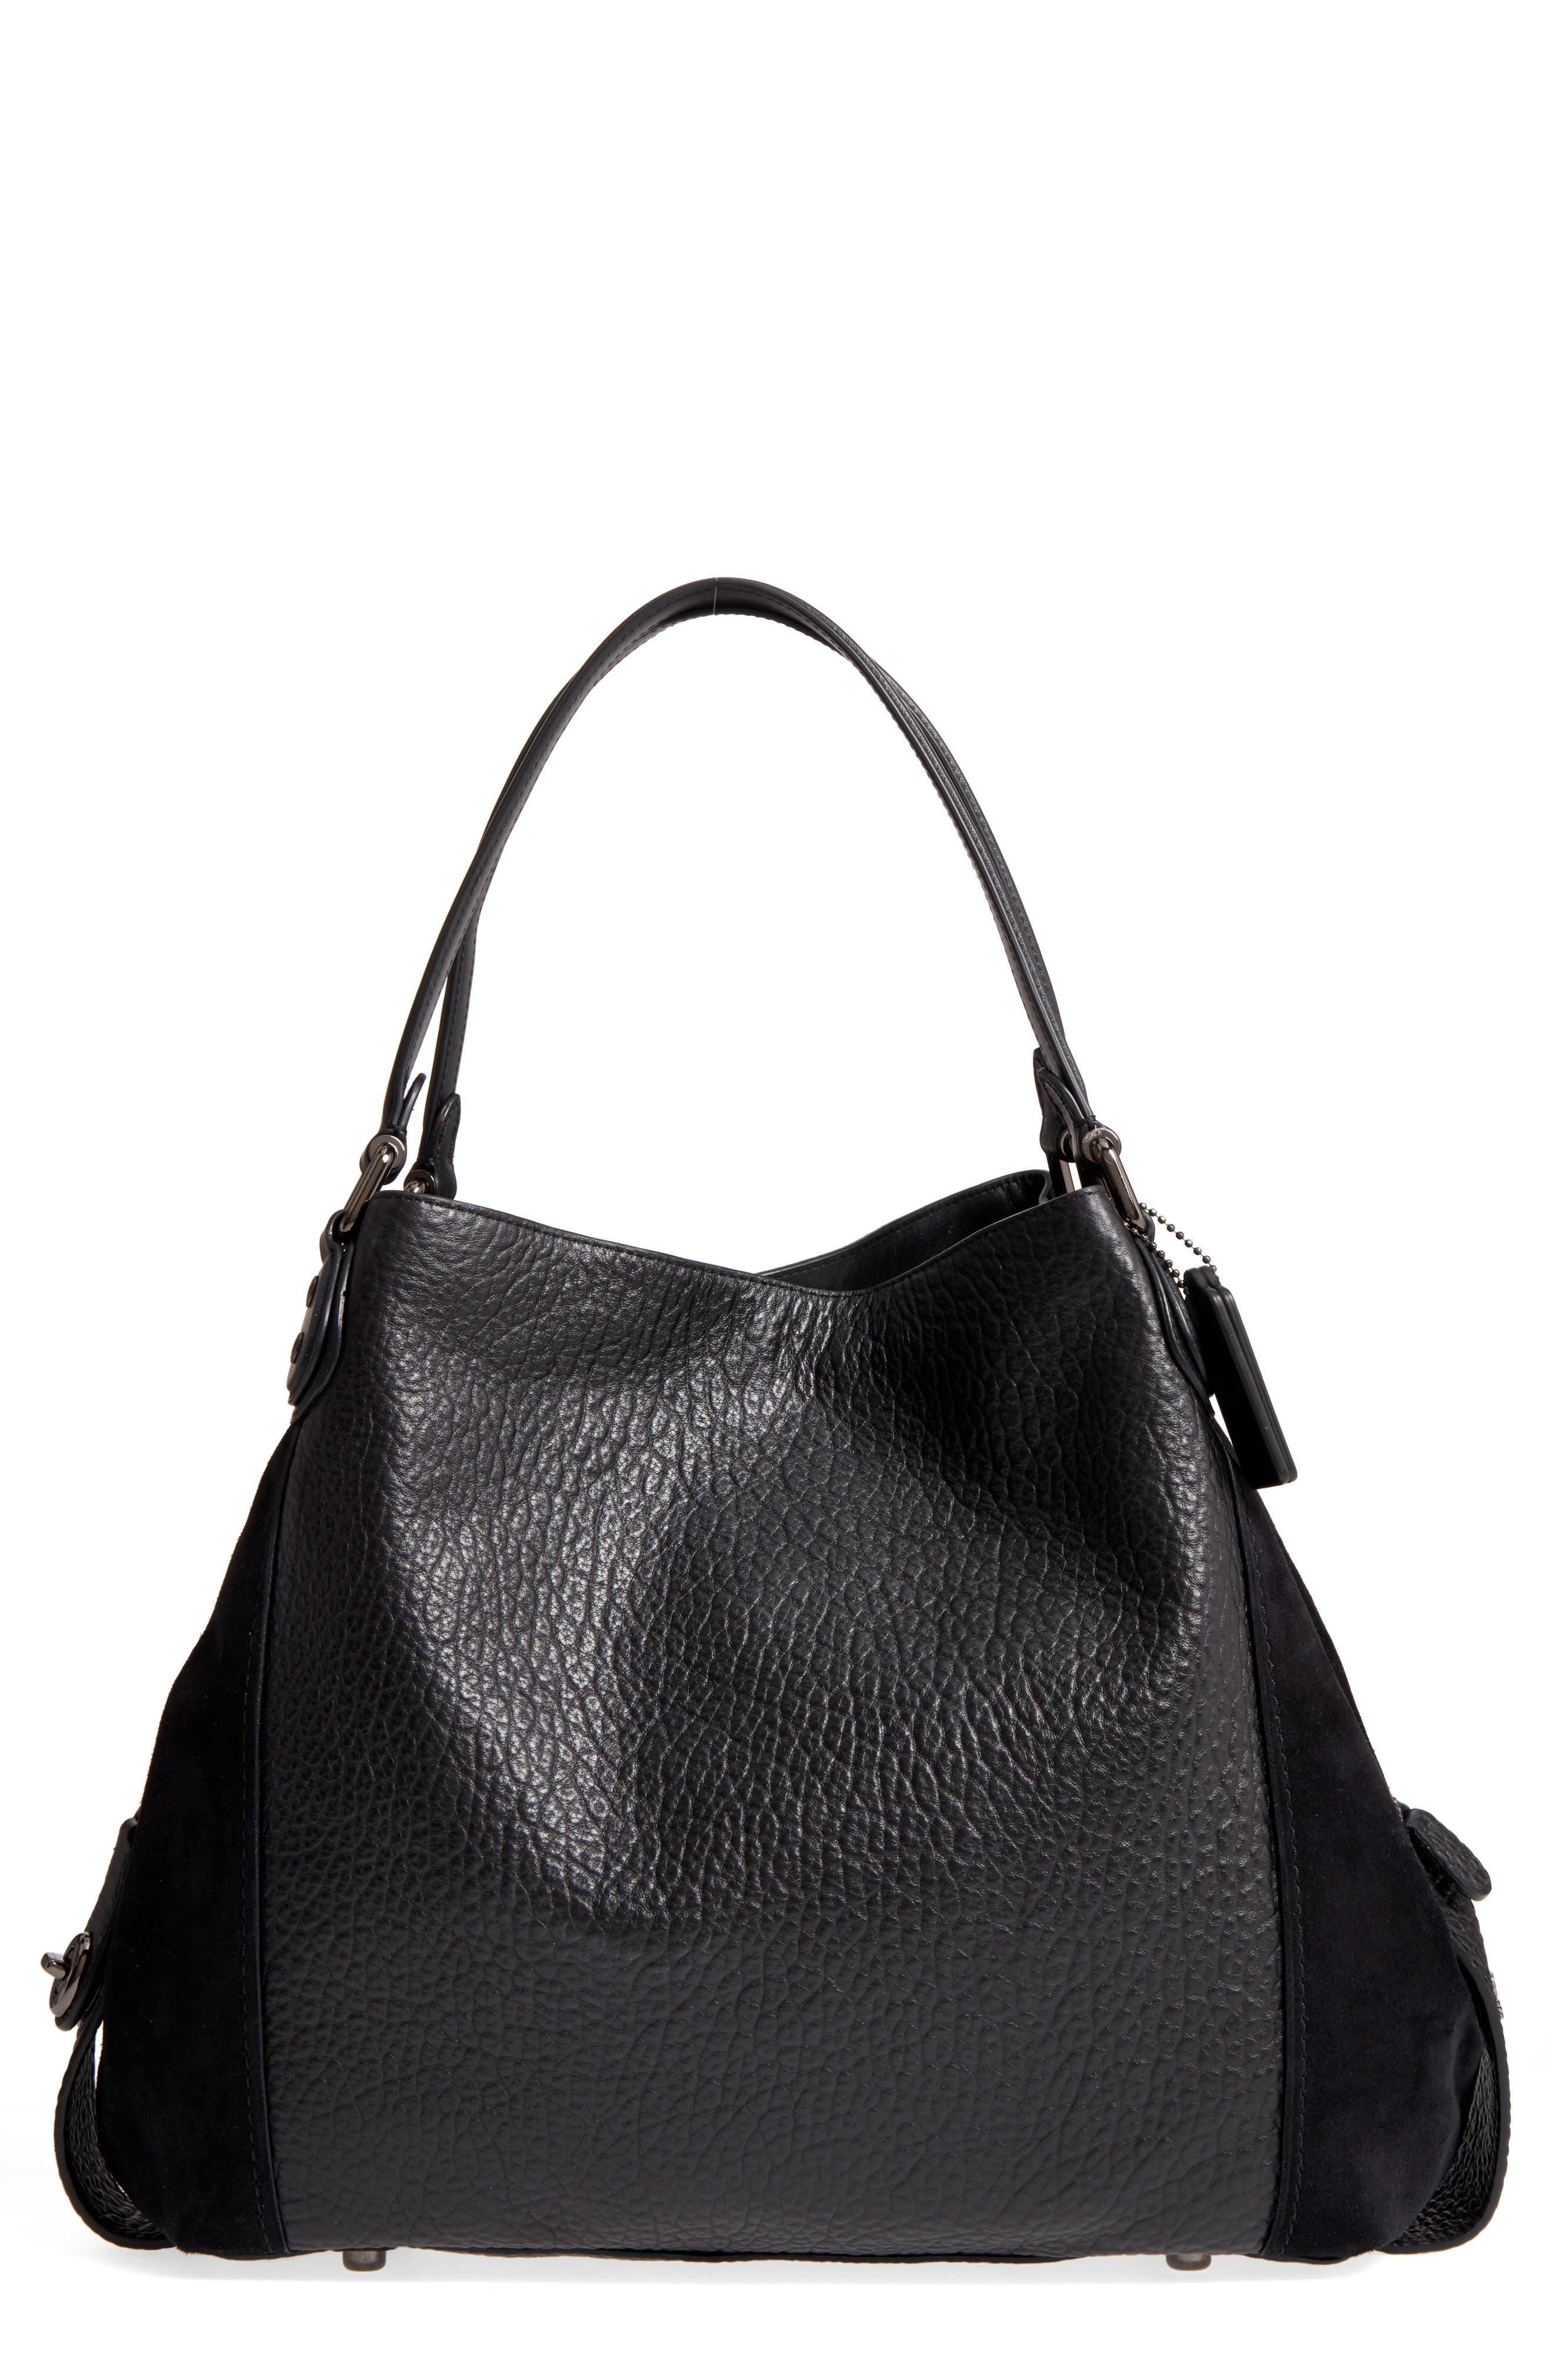 Alternate Image 1 Selected - COACH Edie 42 Leather & Suede Shoulder Bag